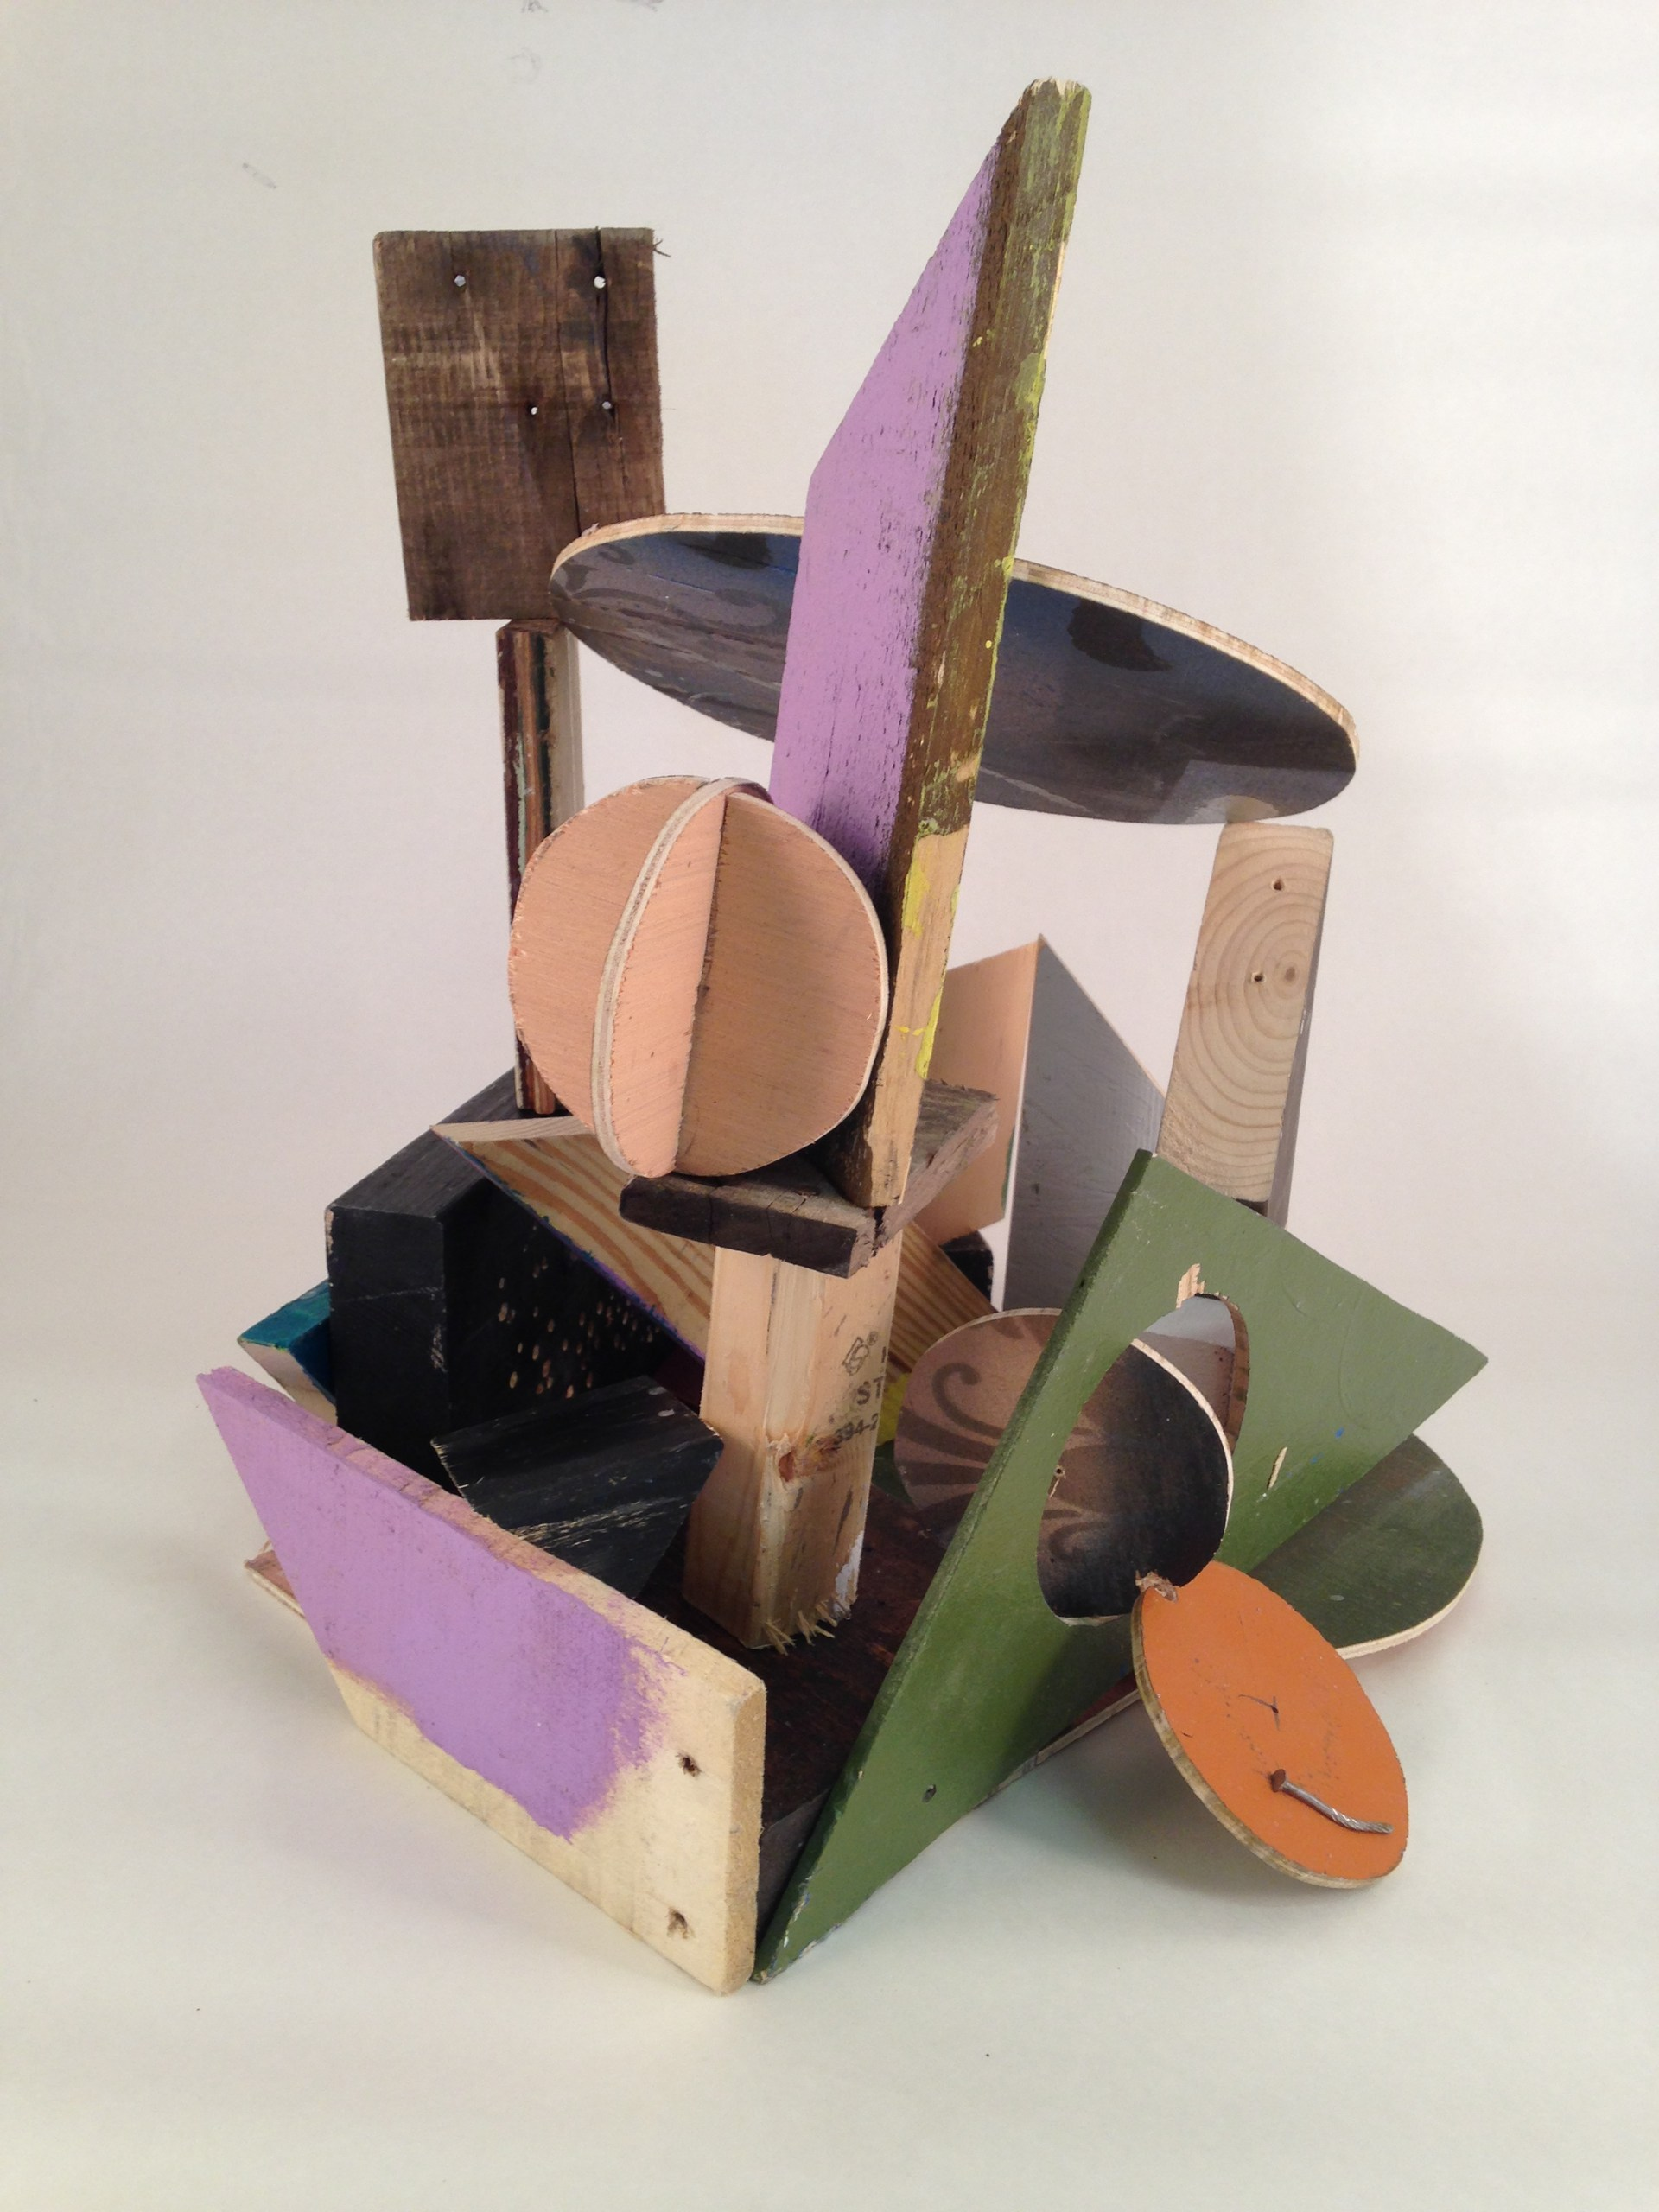 Wood shape sculpture